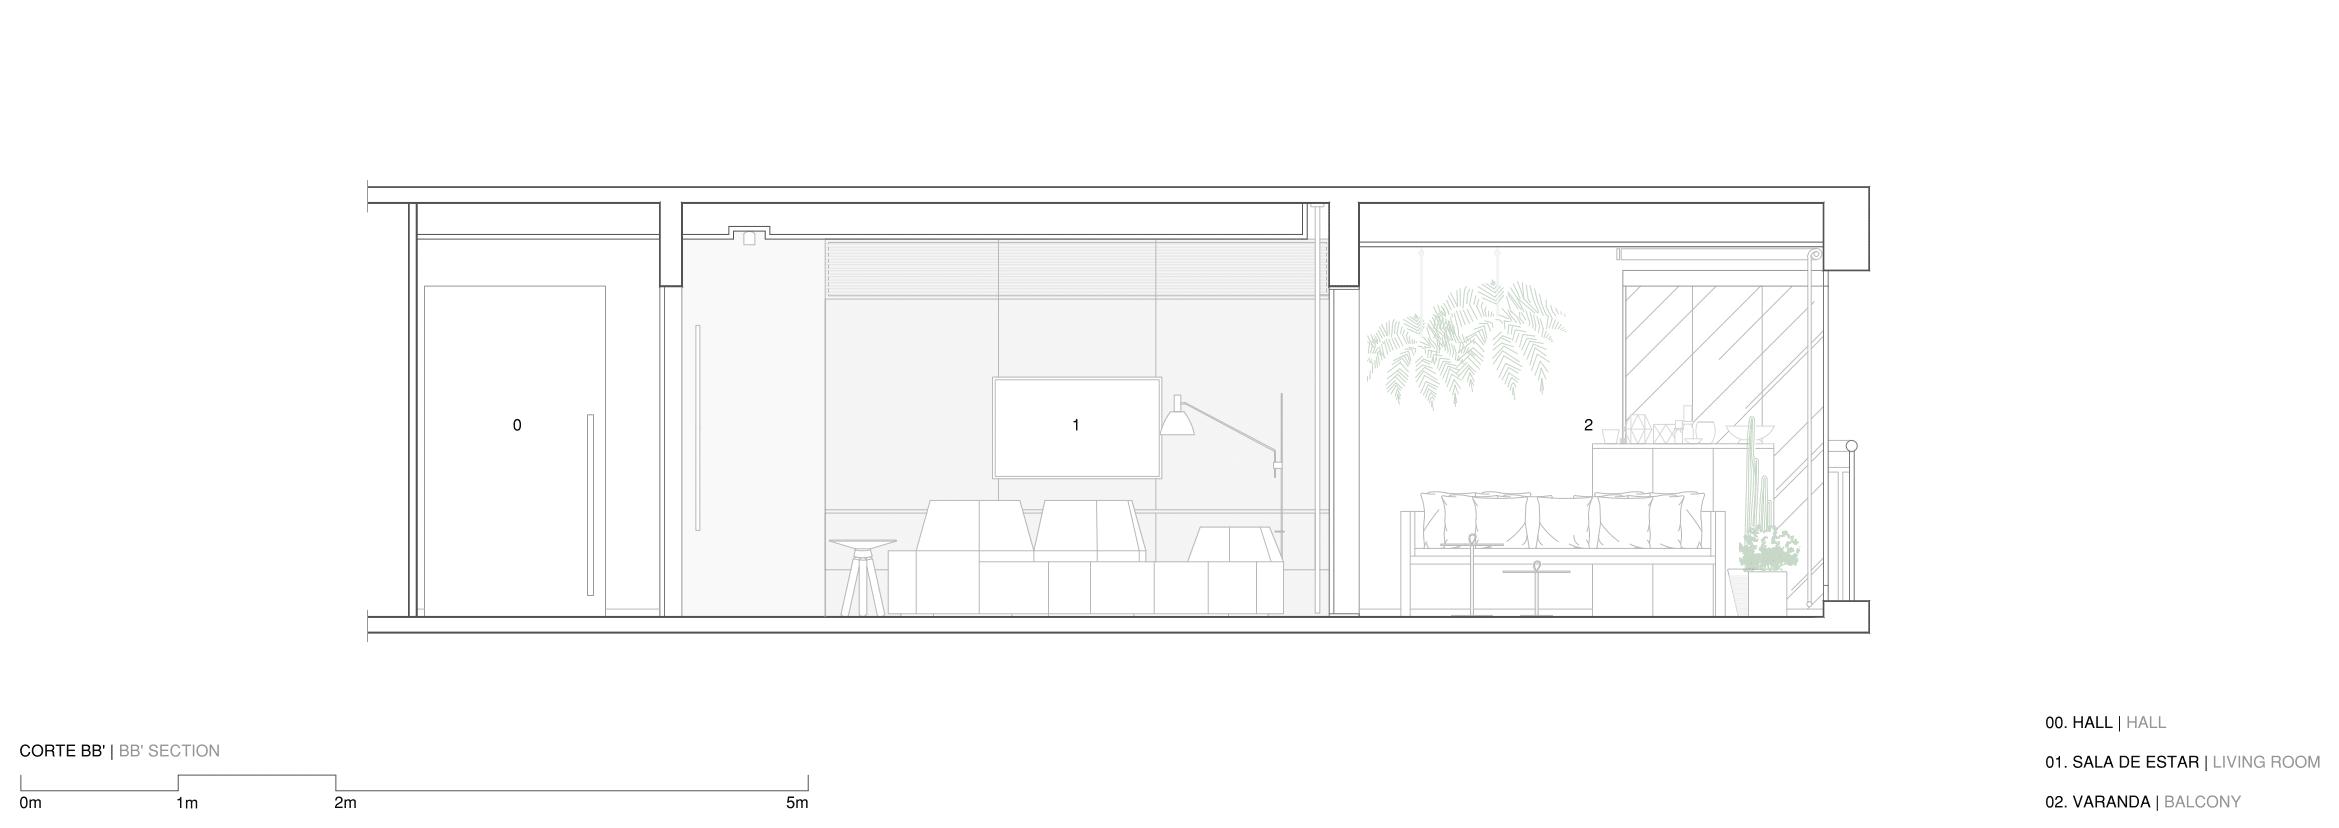 hobjeto-arquitetura-apartamento-fn-ap-03-cortebb